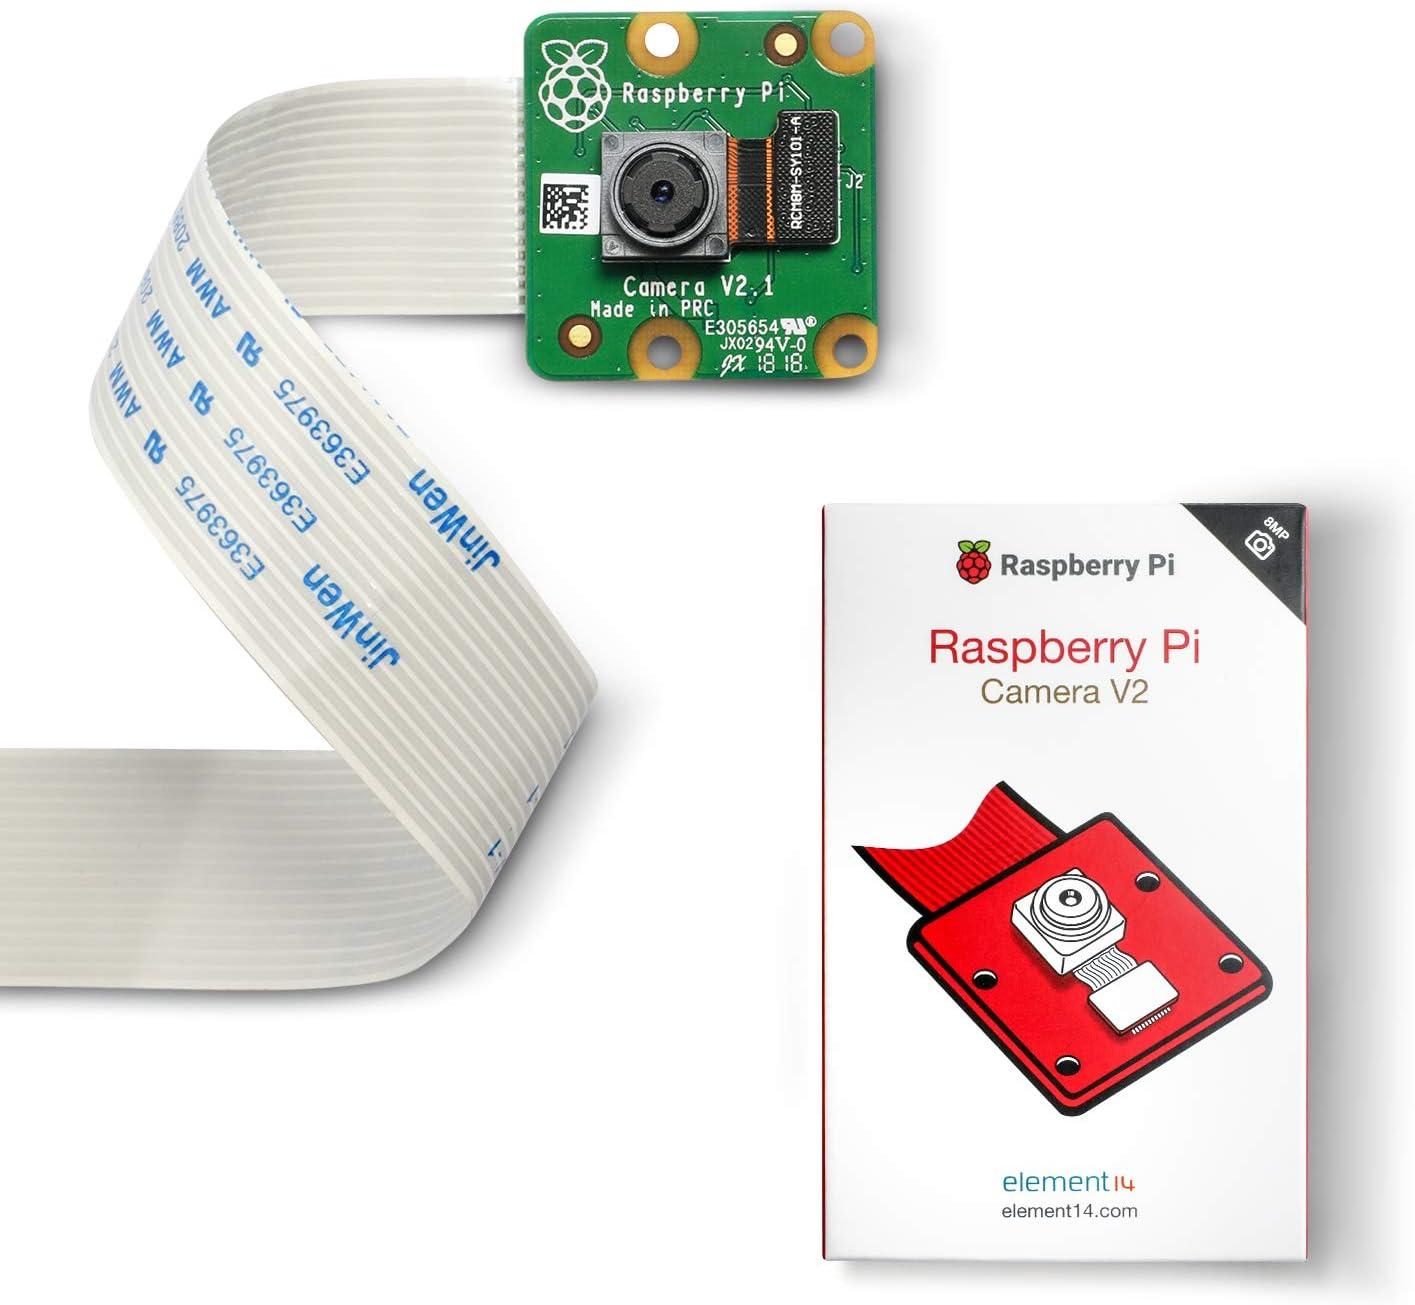 LABISTS Raspberry Pi Camera Module V2 8M, 1080p RPi Camera Officielle avec...